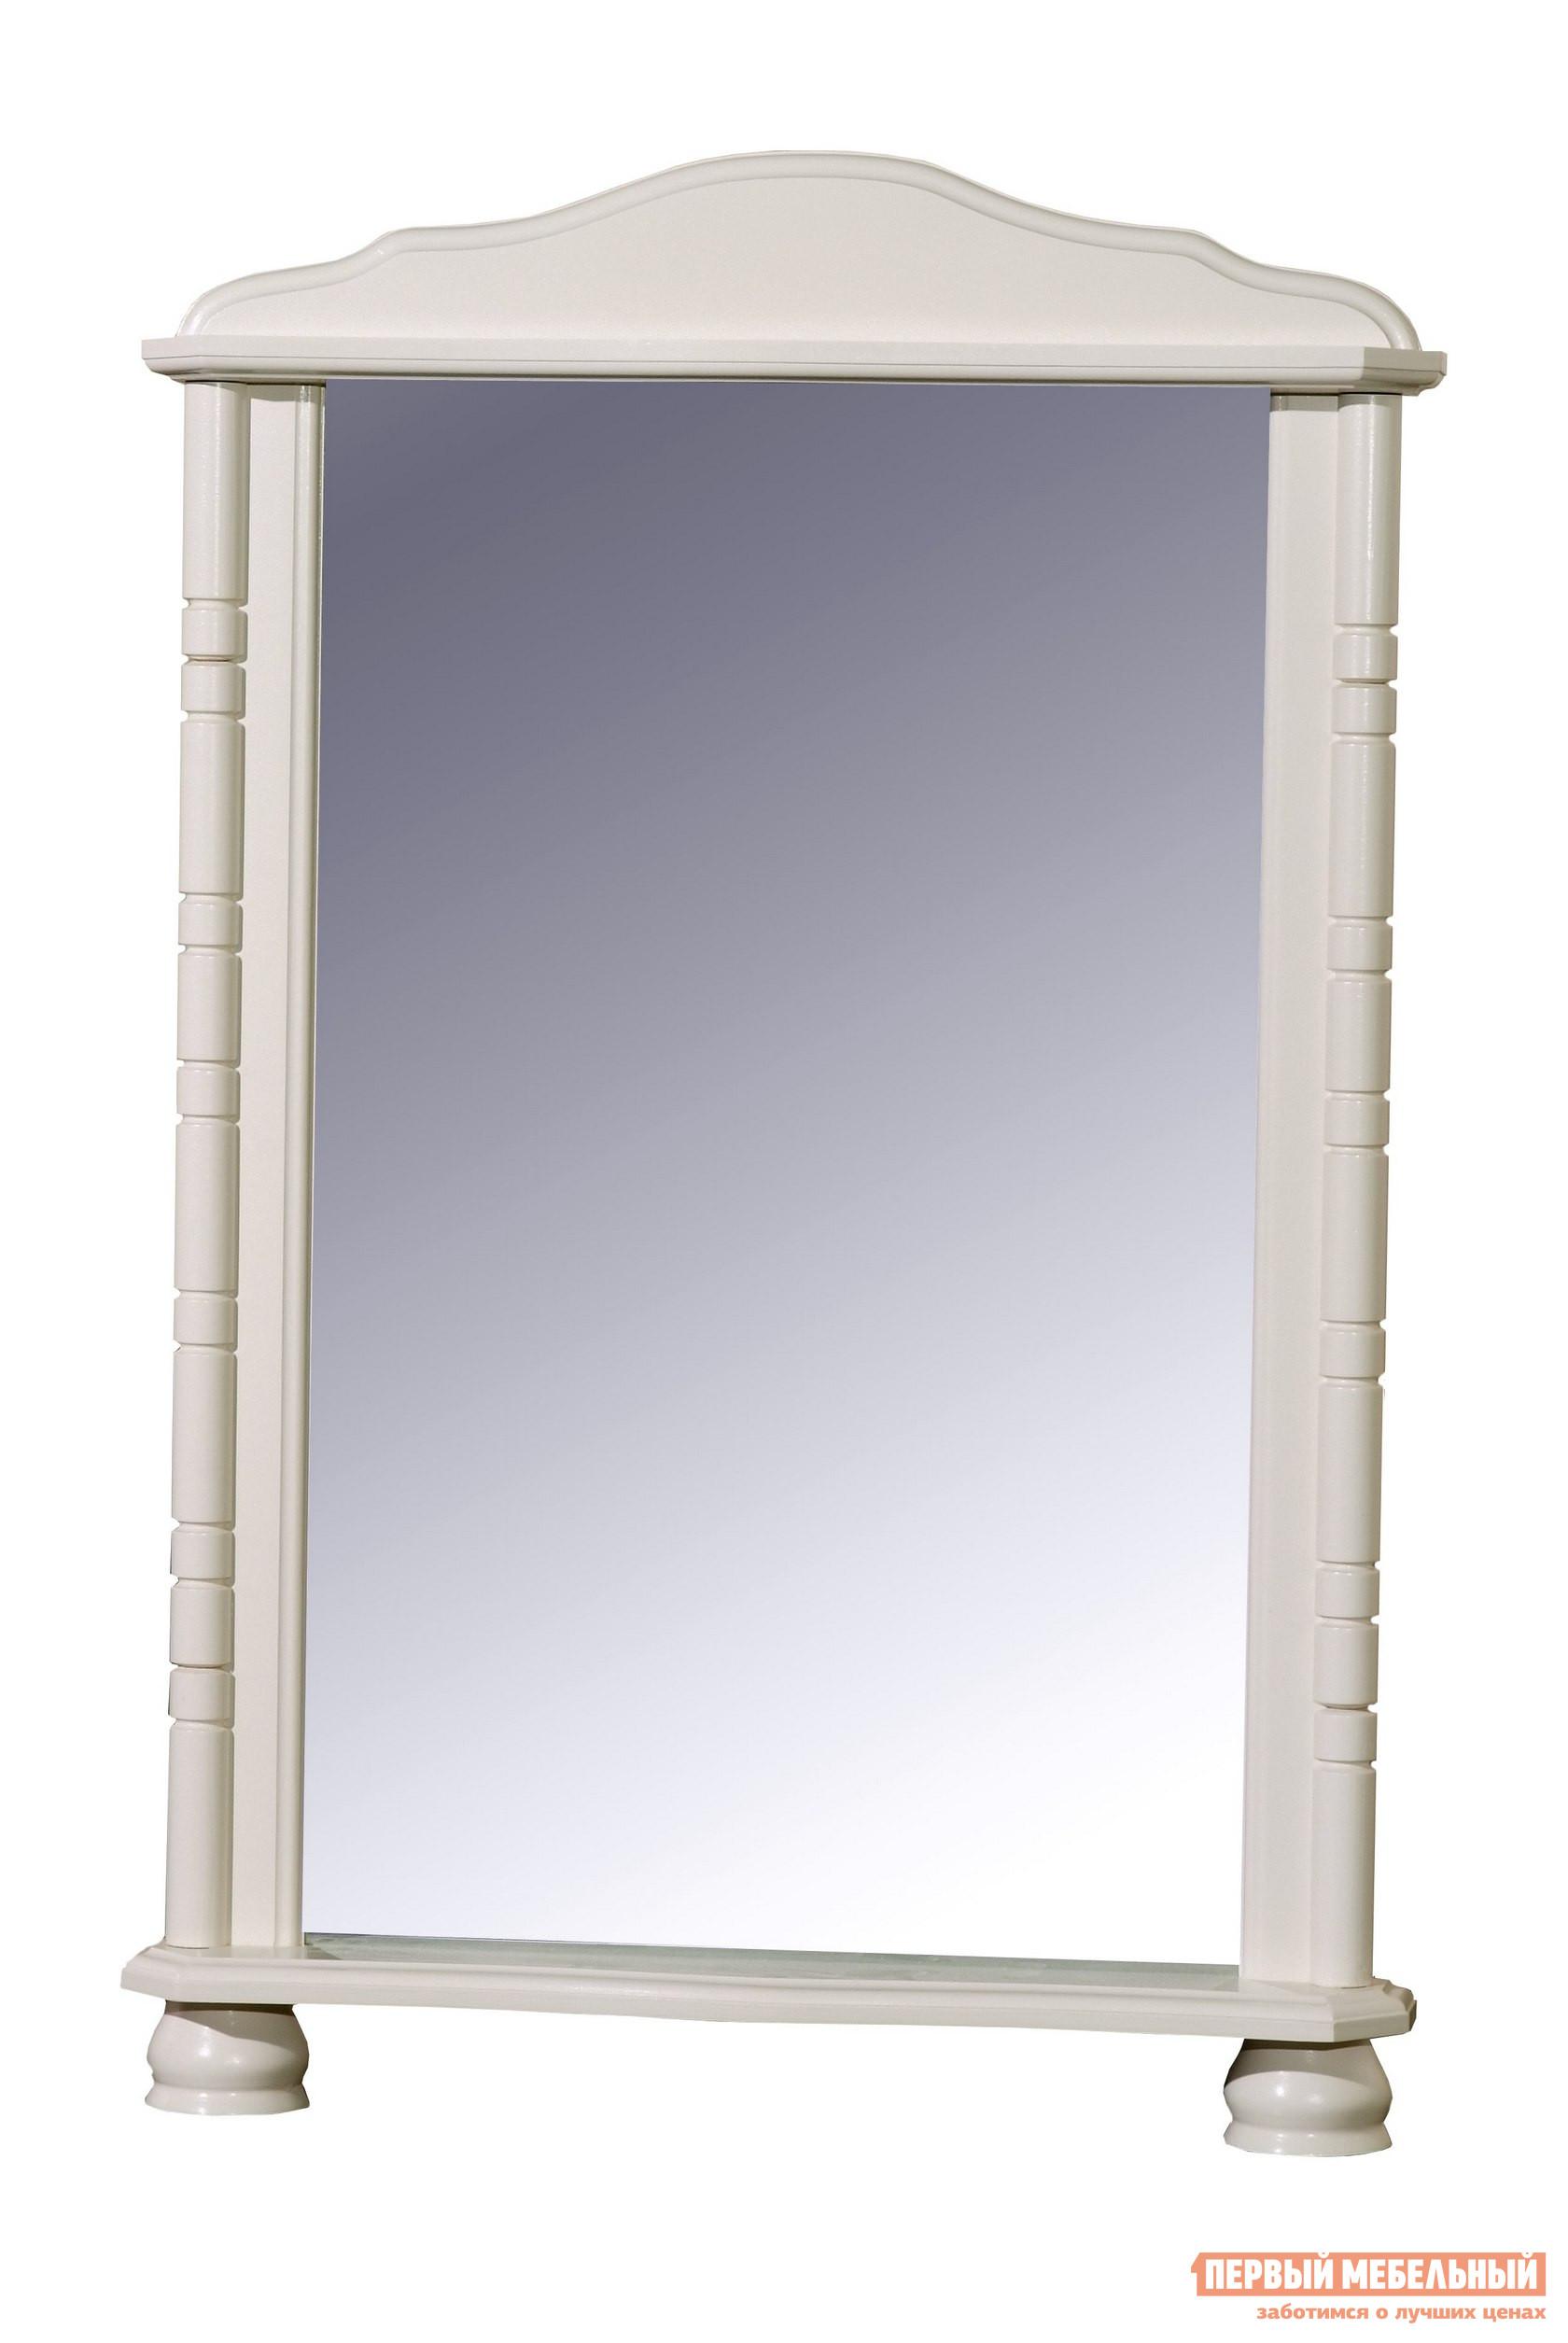 Настенное зеркало Timberica Зеркало Айно